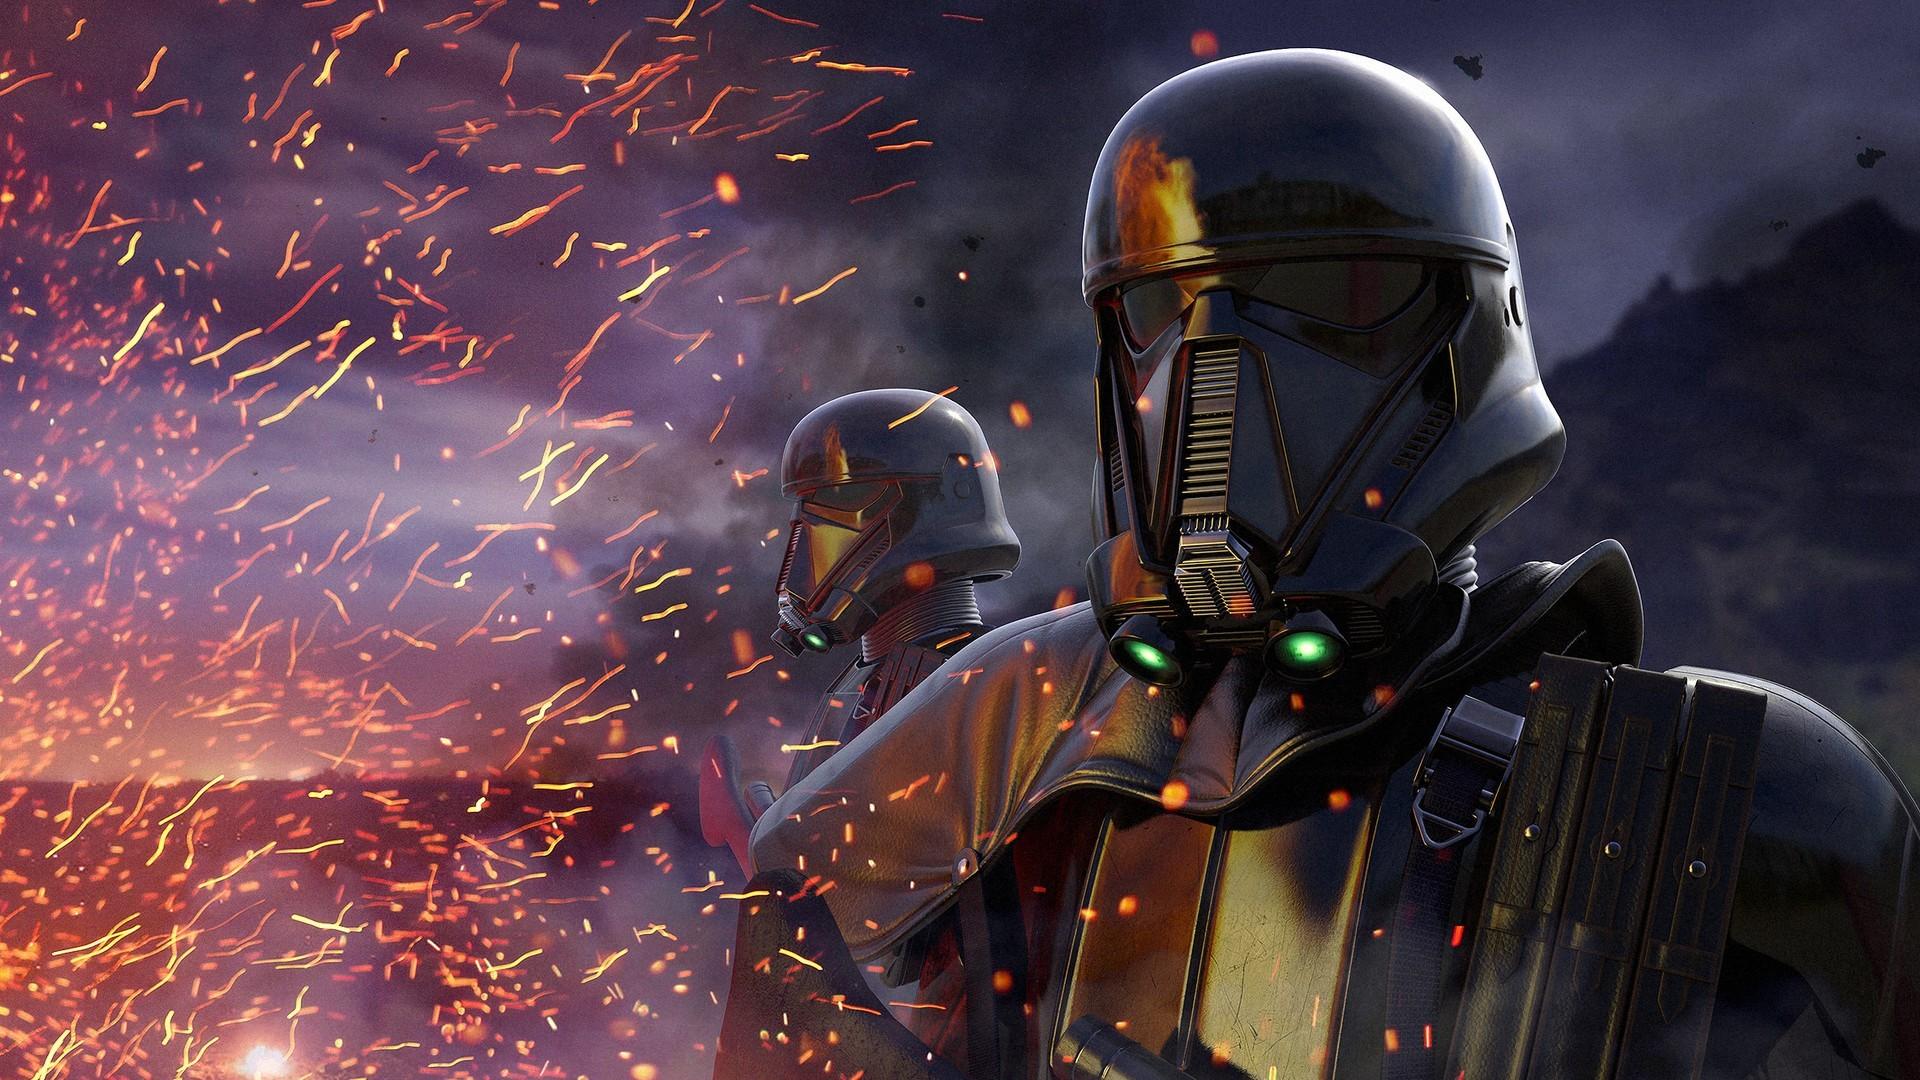 Star Wars Rogue One Wallpaper: Wallpaper : Star Wars, Digital Art, Helmet, Science